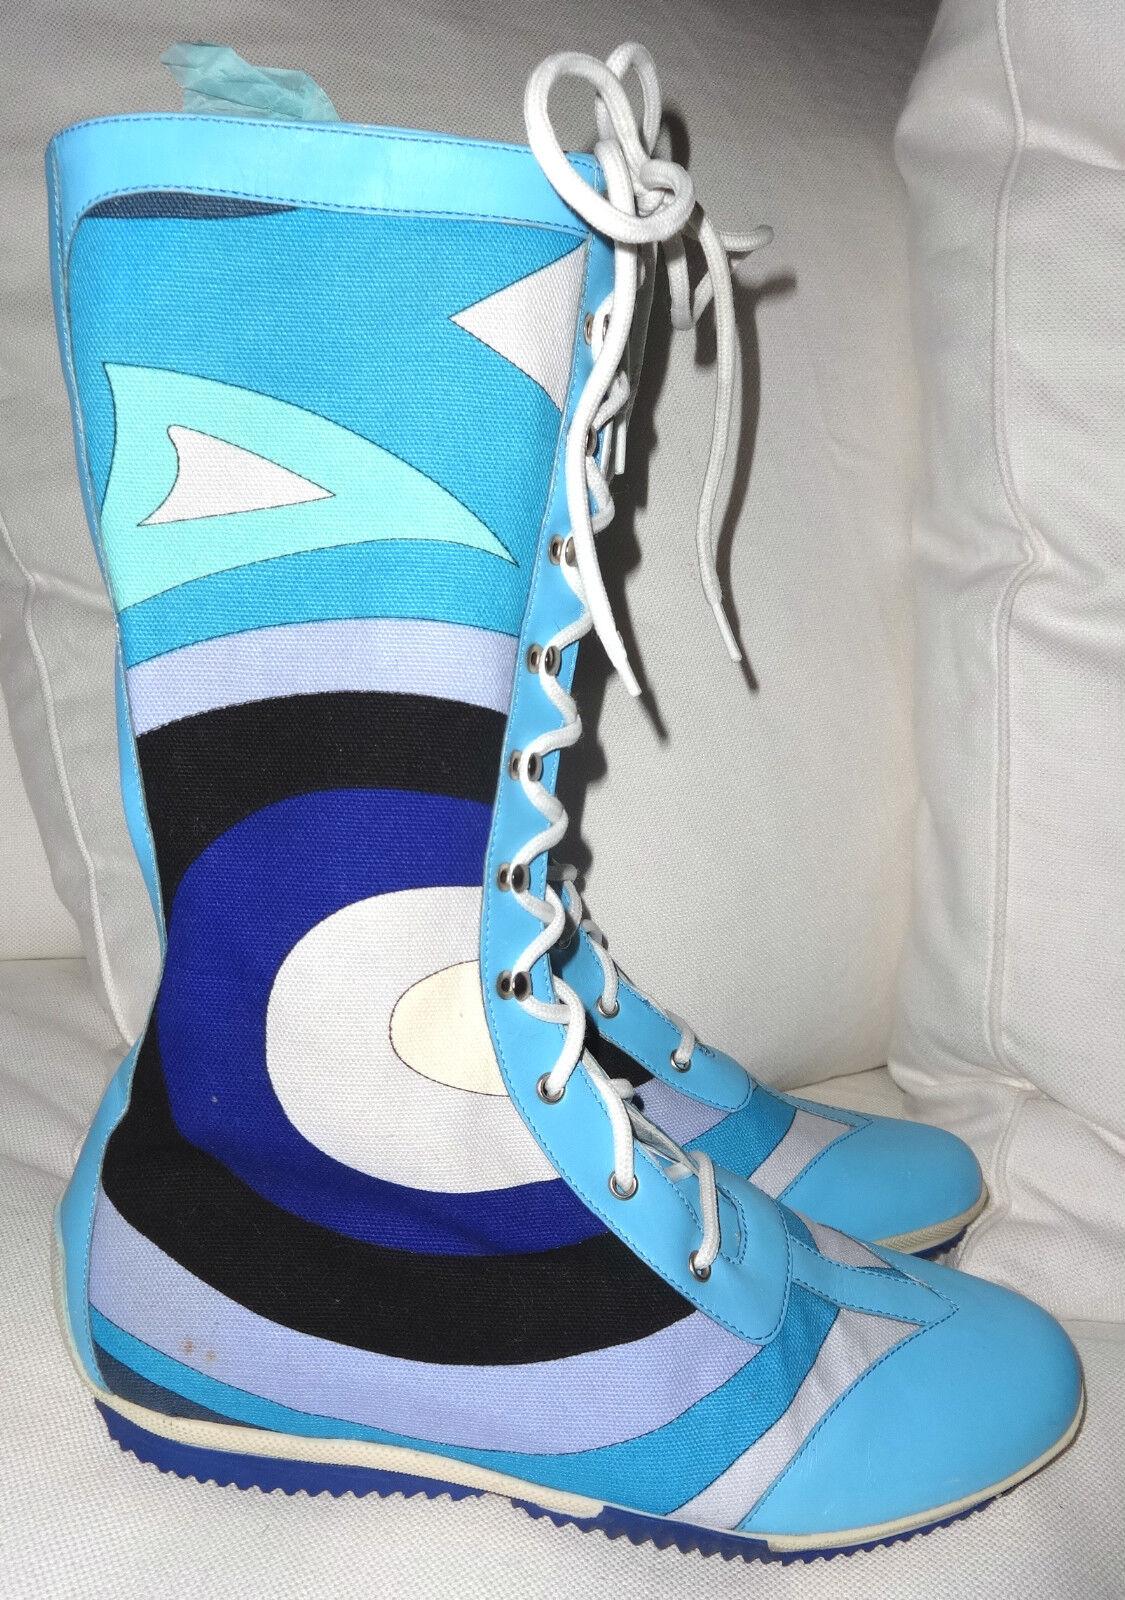 Rare emilio pucci boxer botas nuevo. 39